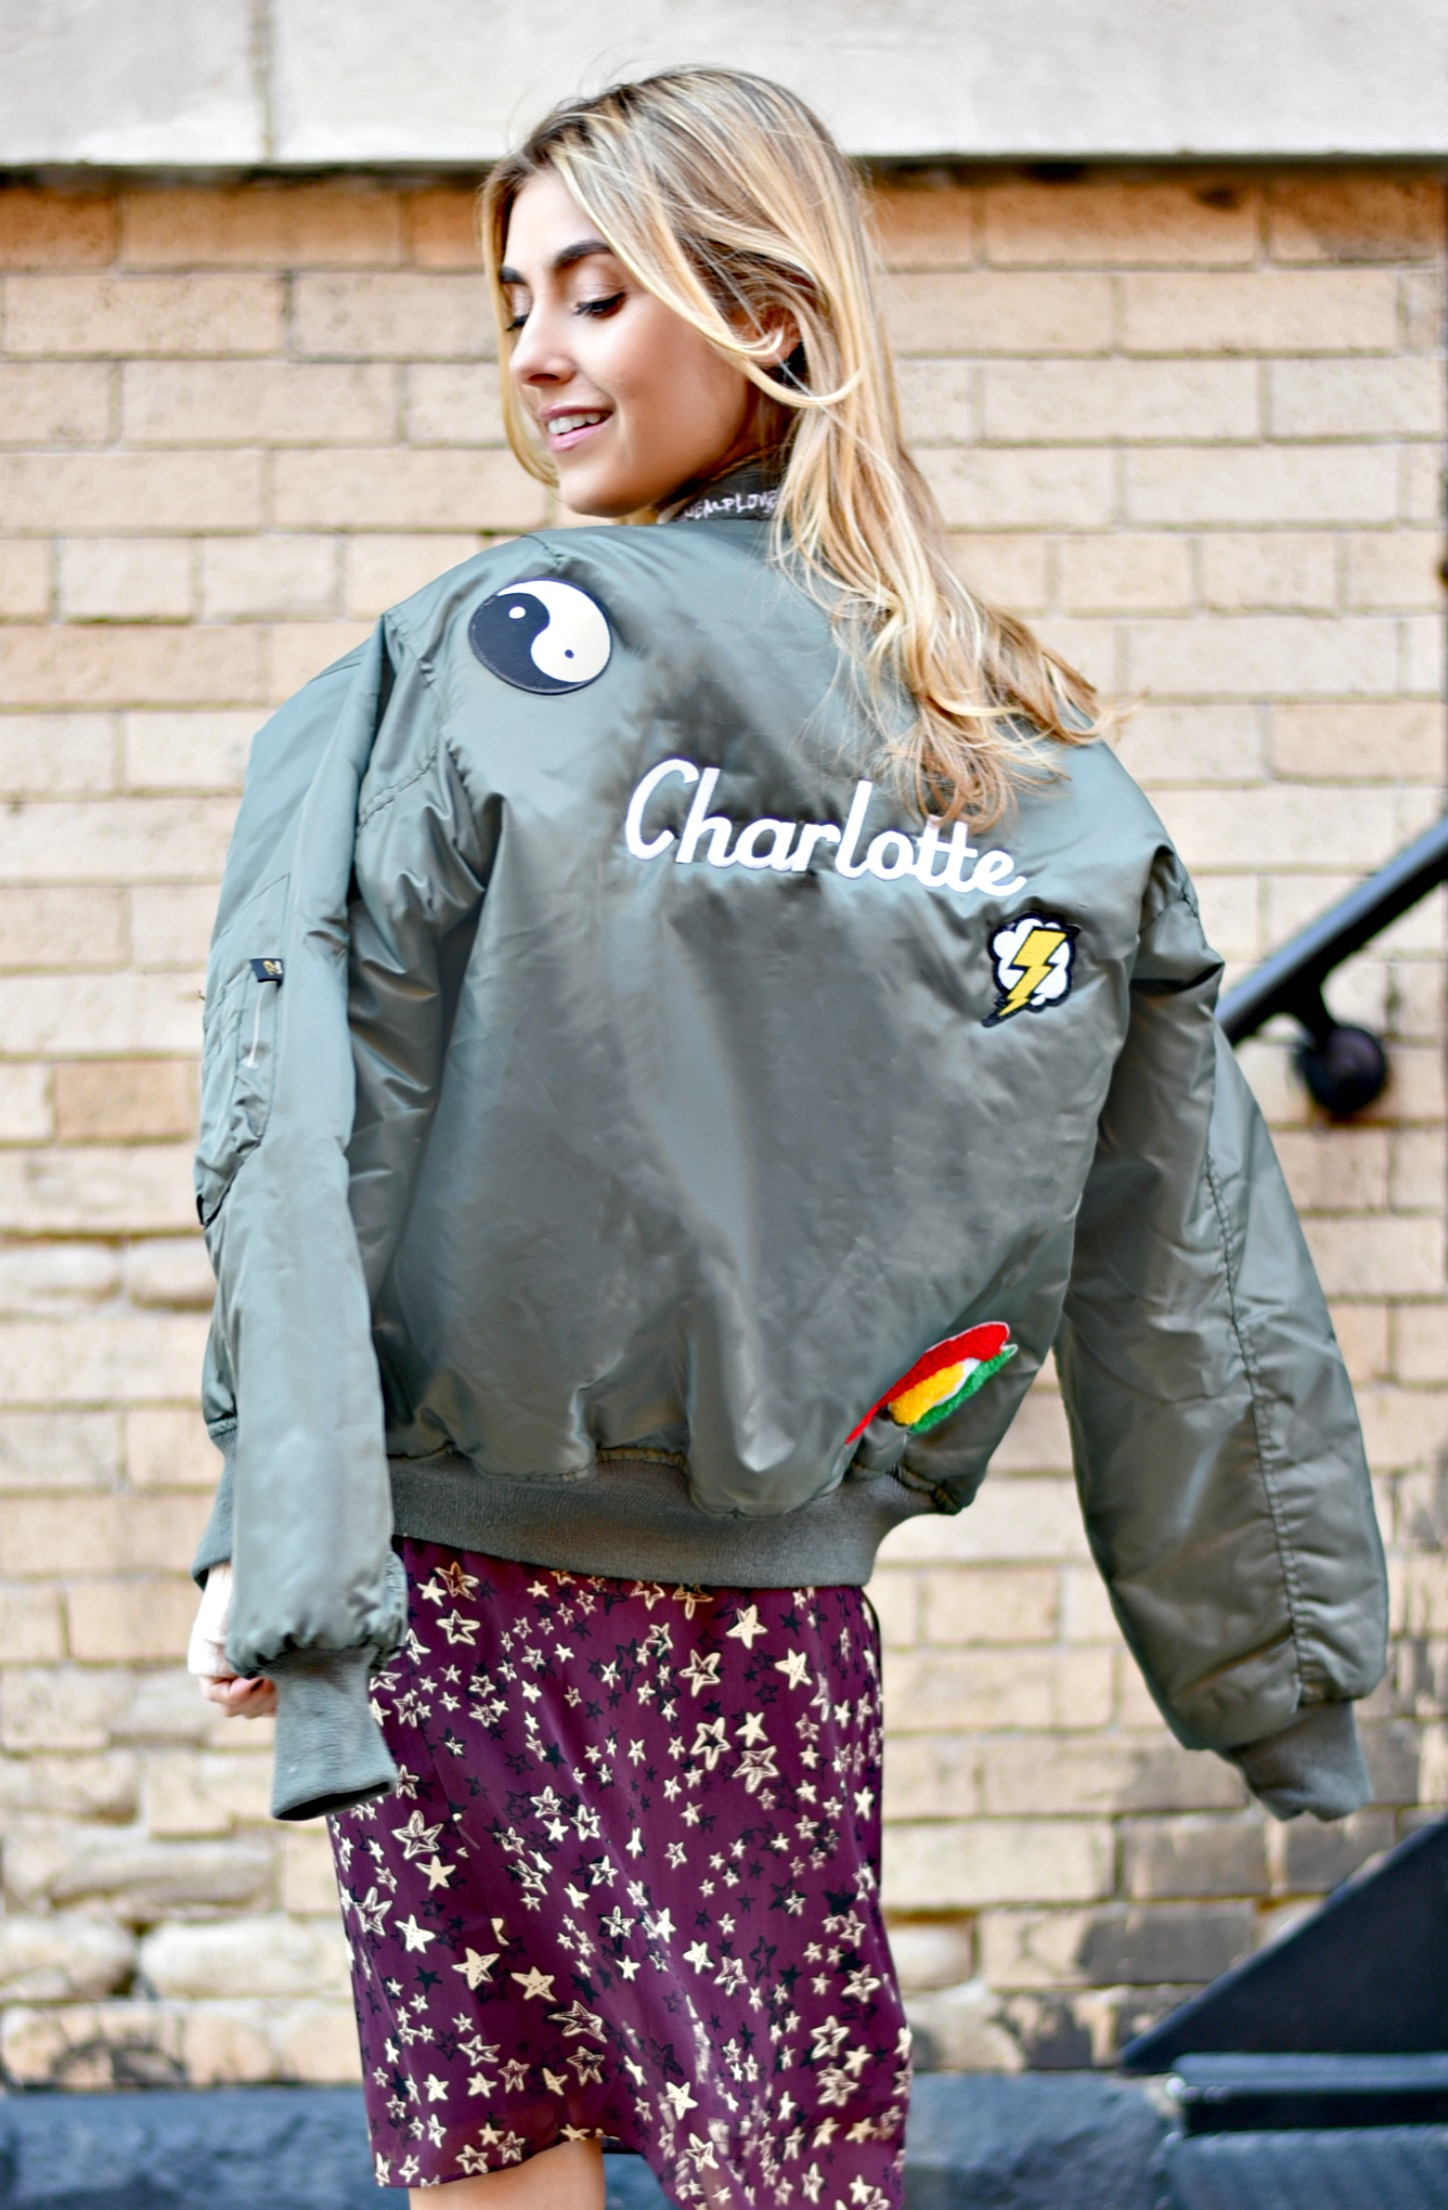 CHARLOTTE BICKLEY YIN 2MY YANG SISTER FASHION BLOGGERS NYC UNEMPLOYED DENIM PERSONALIZED BOMBER JACKET POST 5.jpg